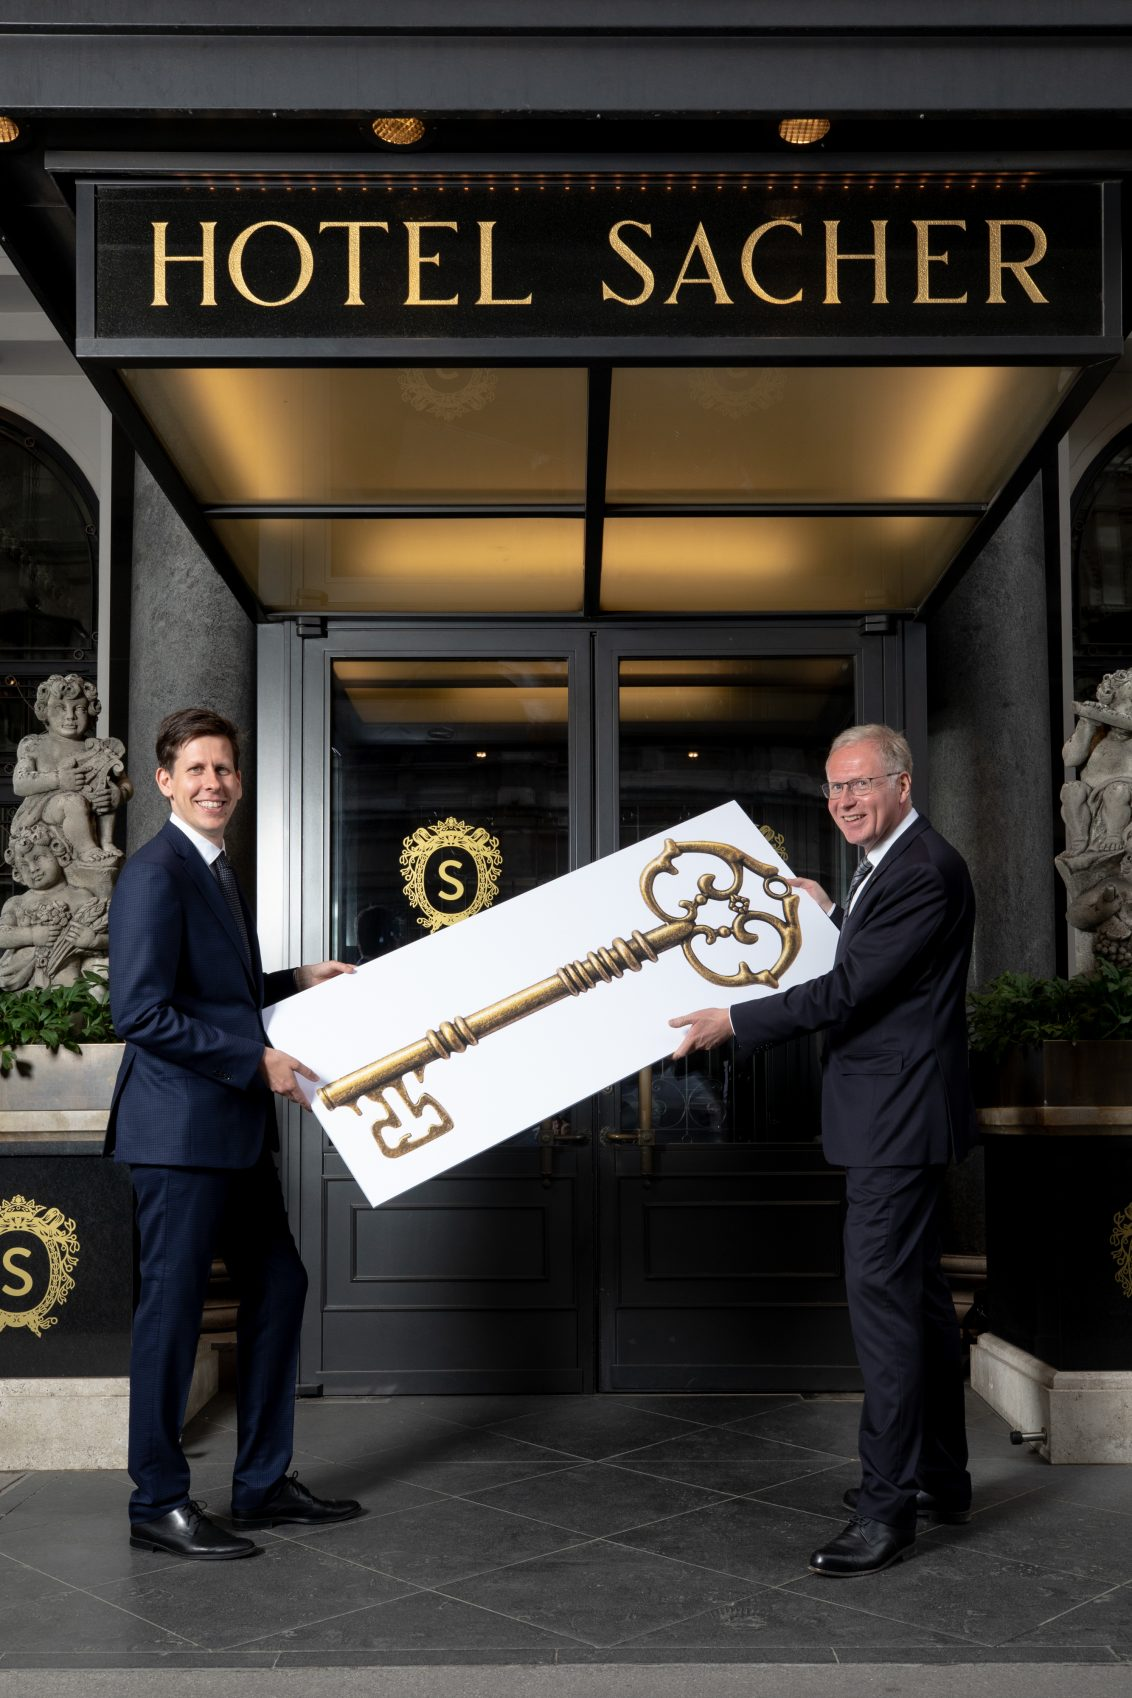 Hotel Sacher Hoteldirekrot